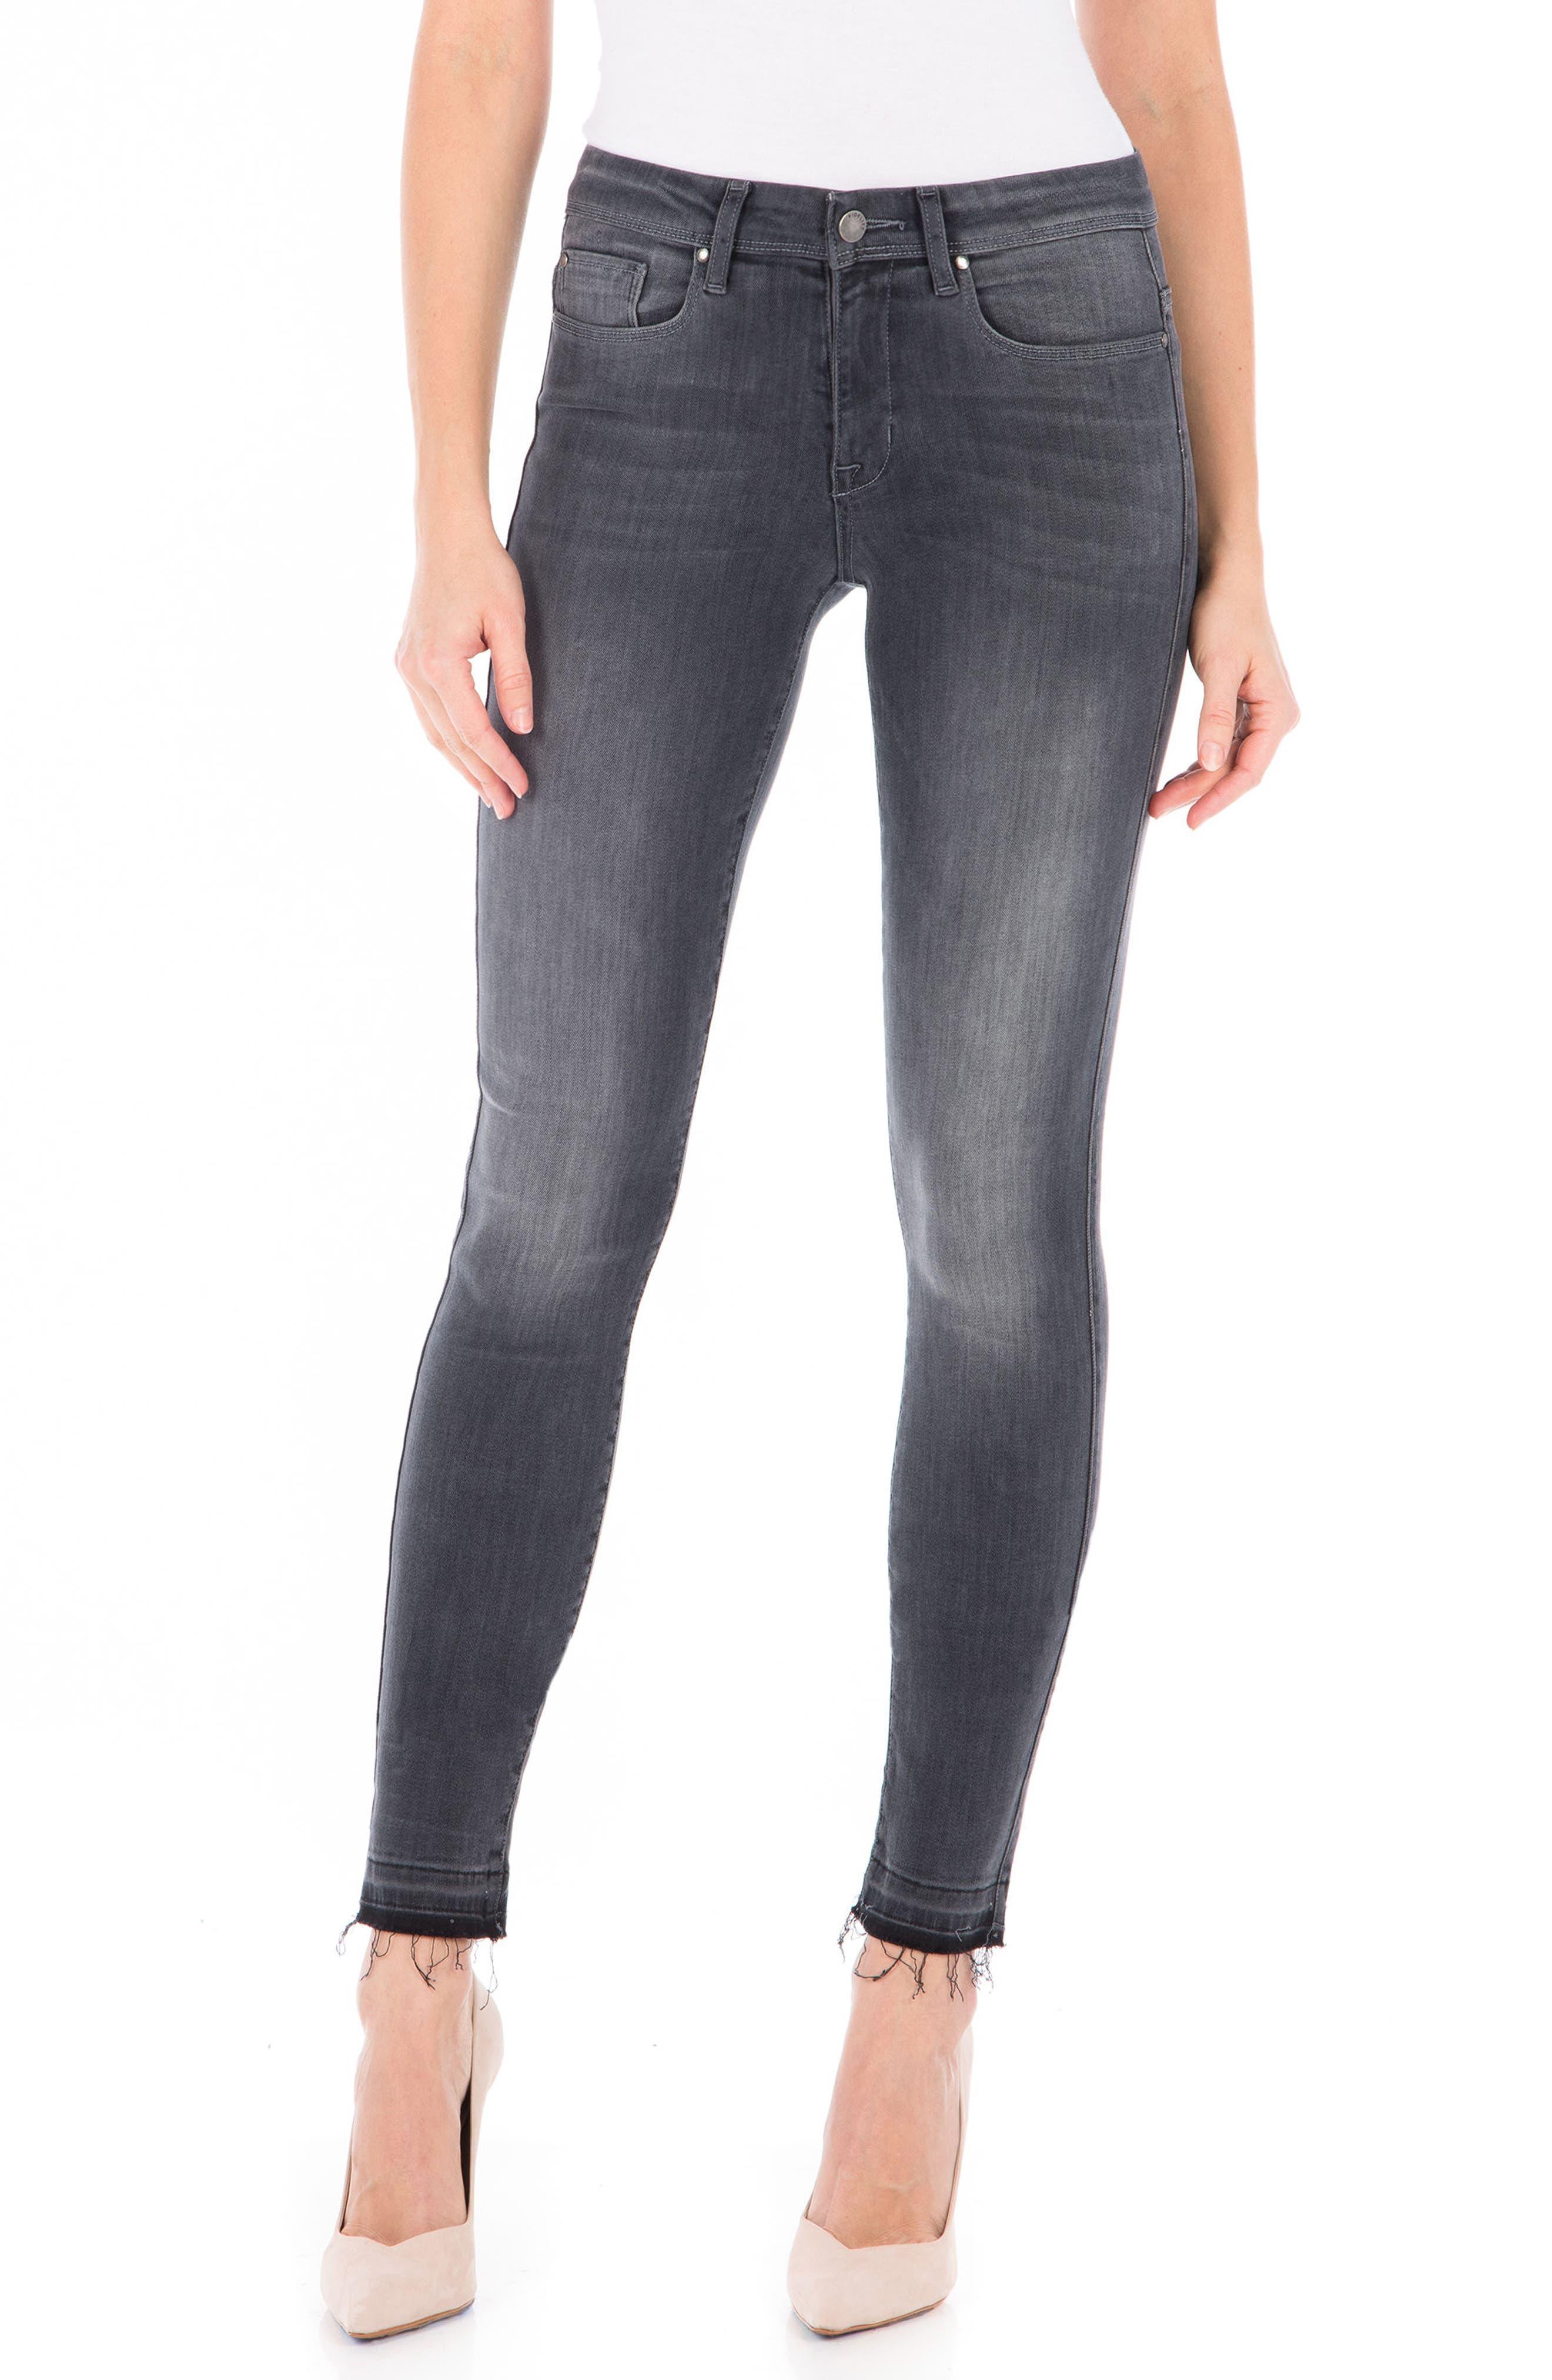 Gwen High Waist Skinny Jeans,                         Main,                         color, Mystic Black